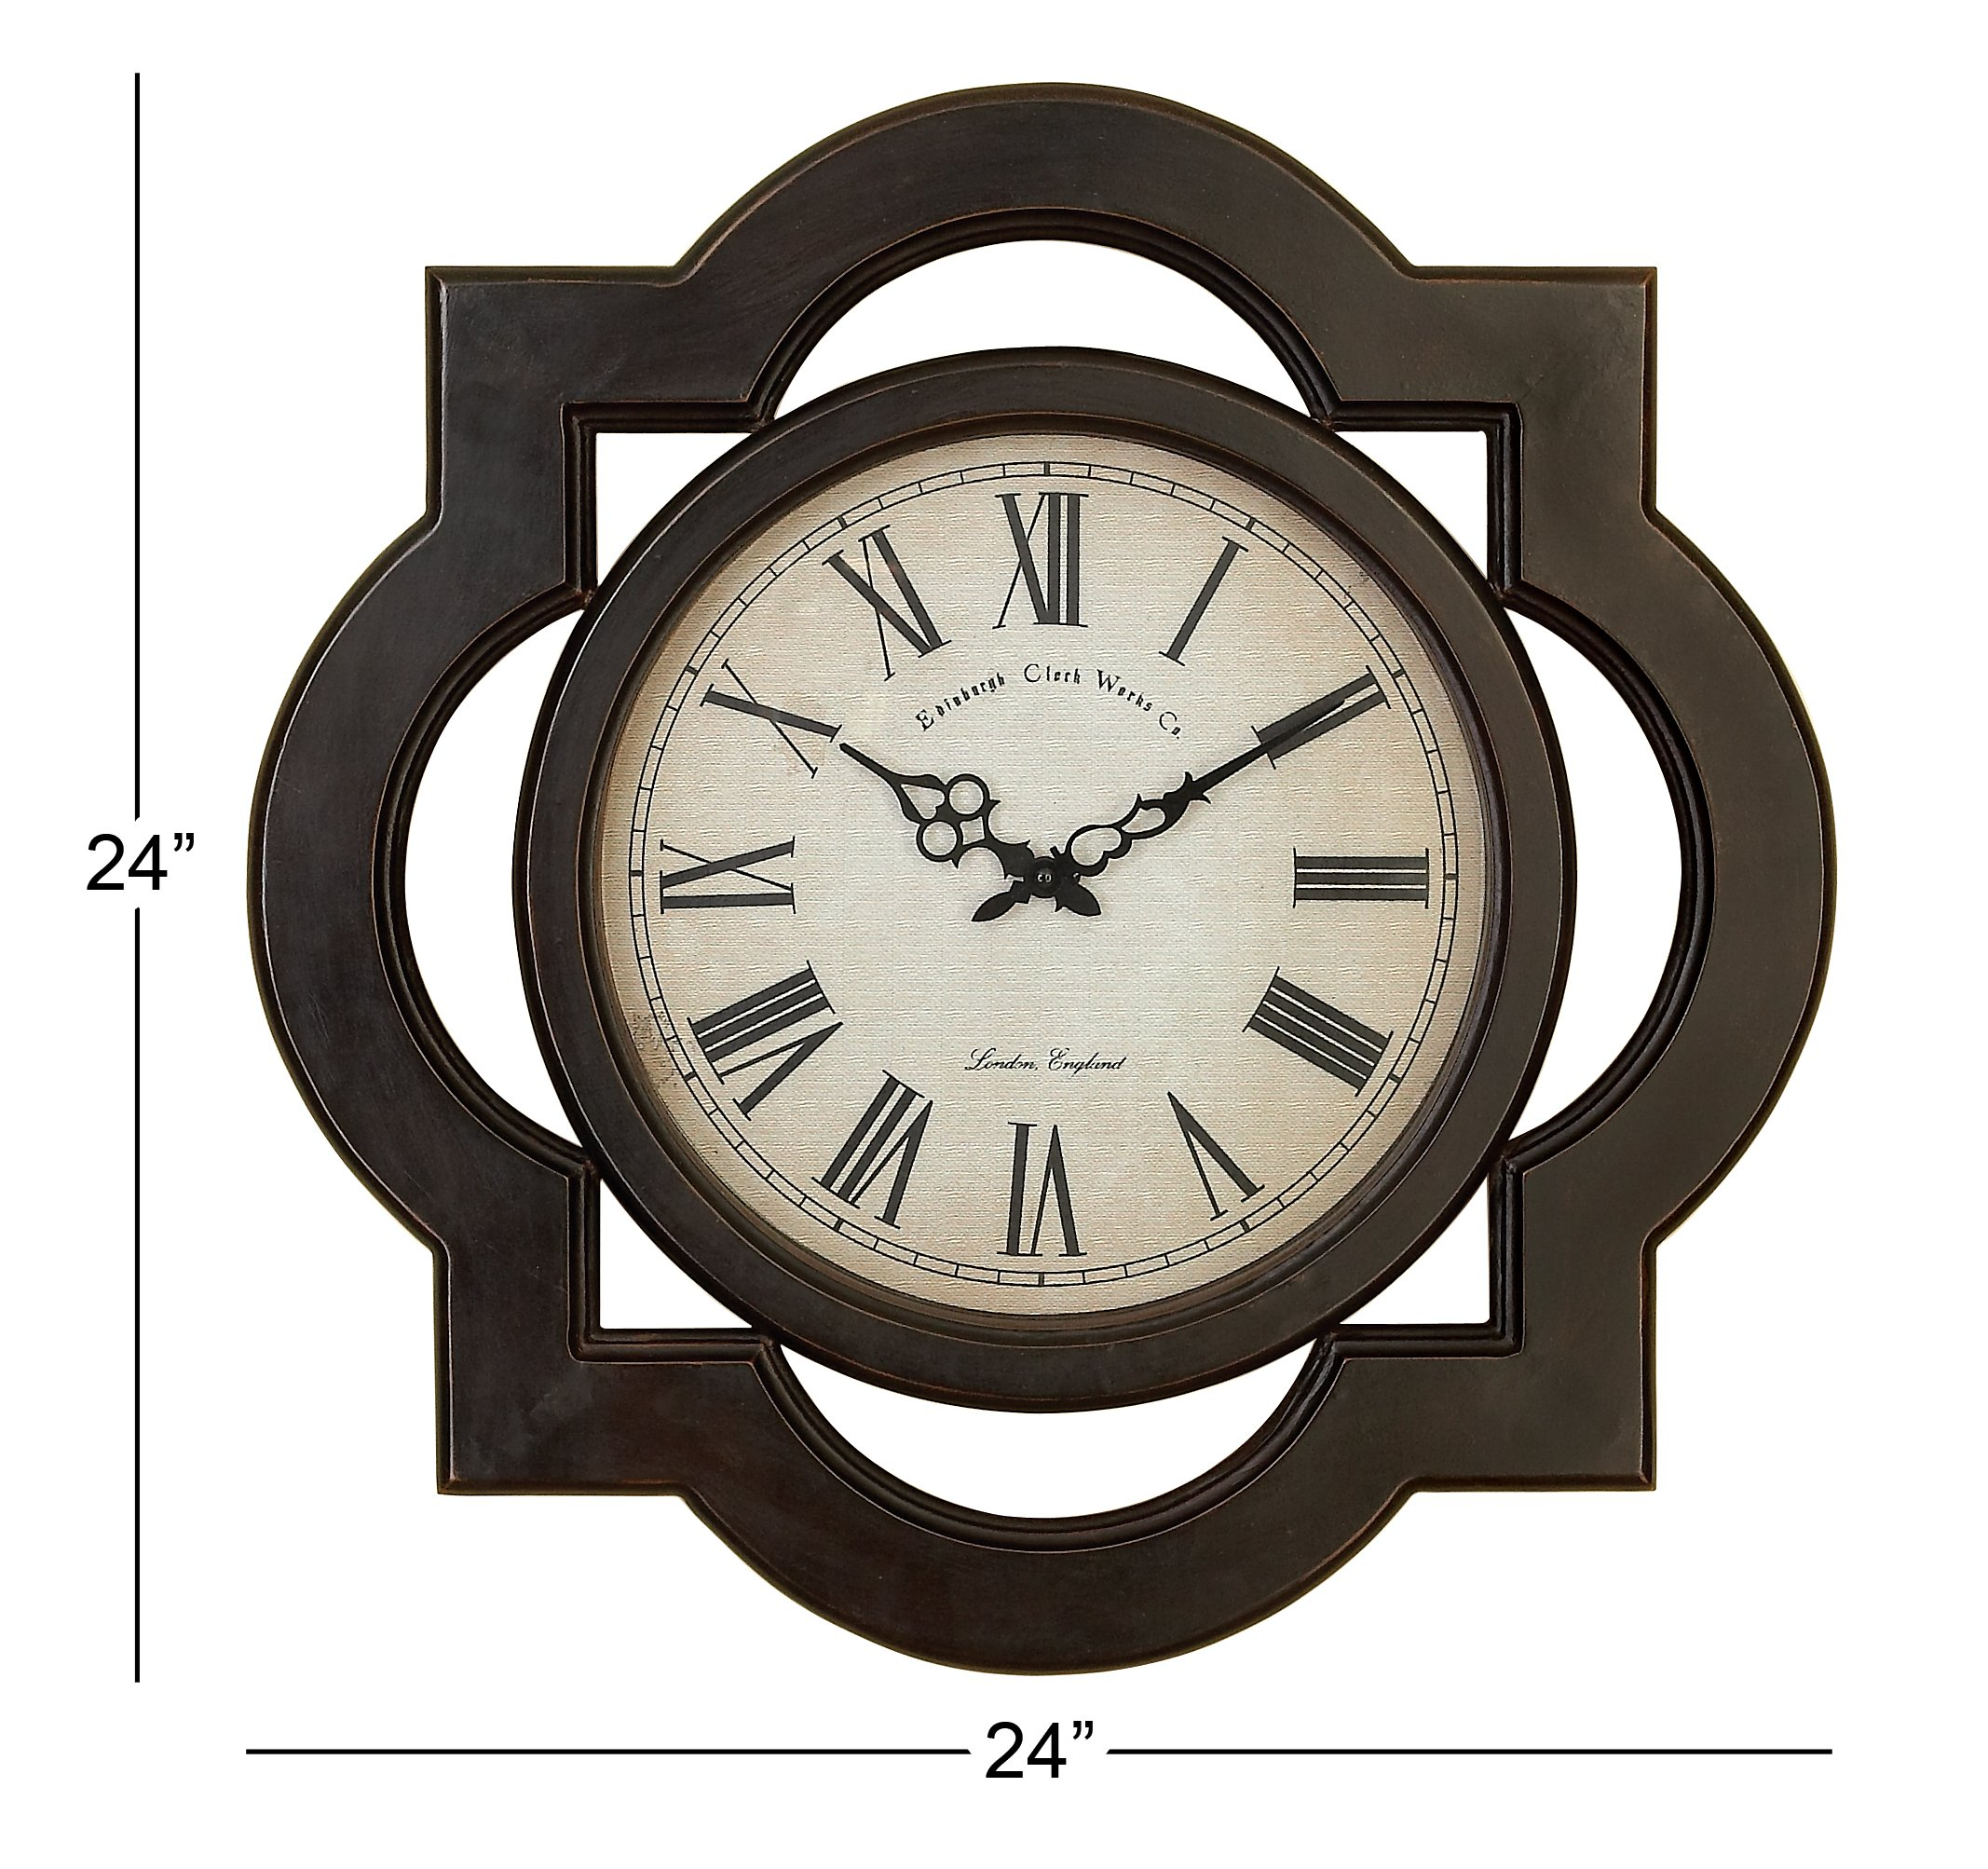 Deco 79 81667 Wood Wall Clock Uniquely Scalloped